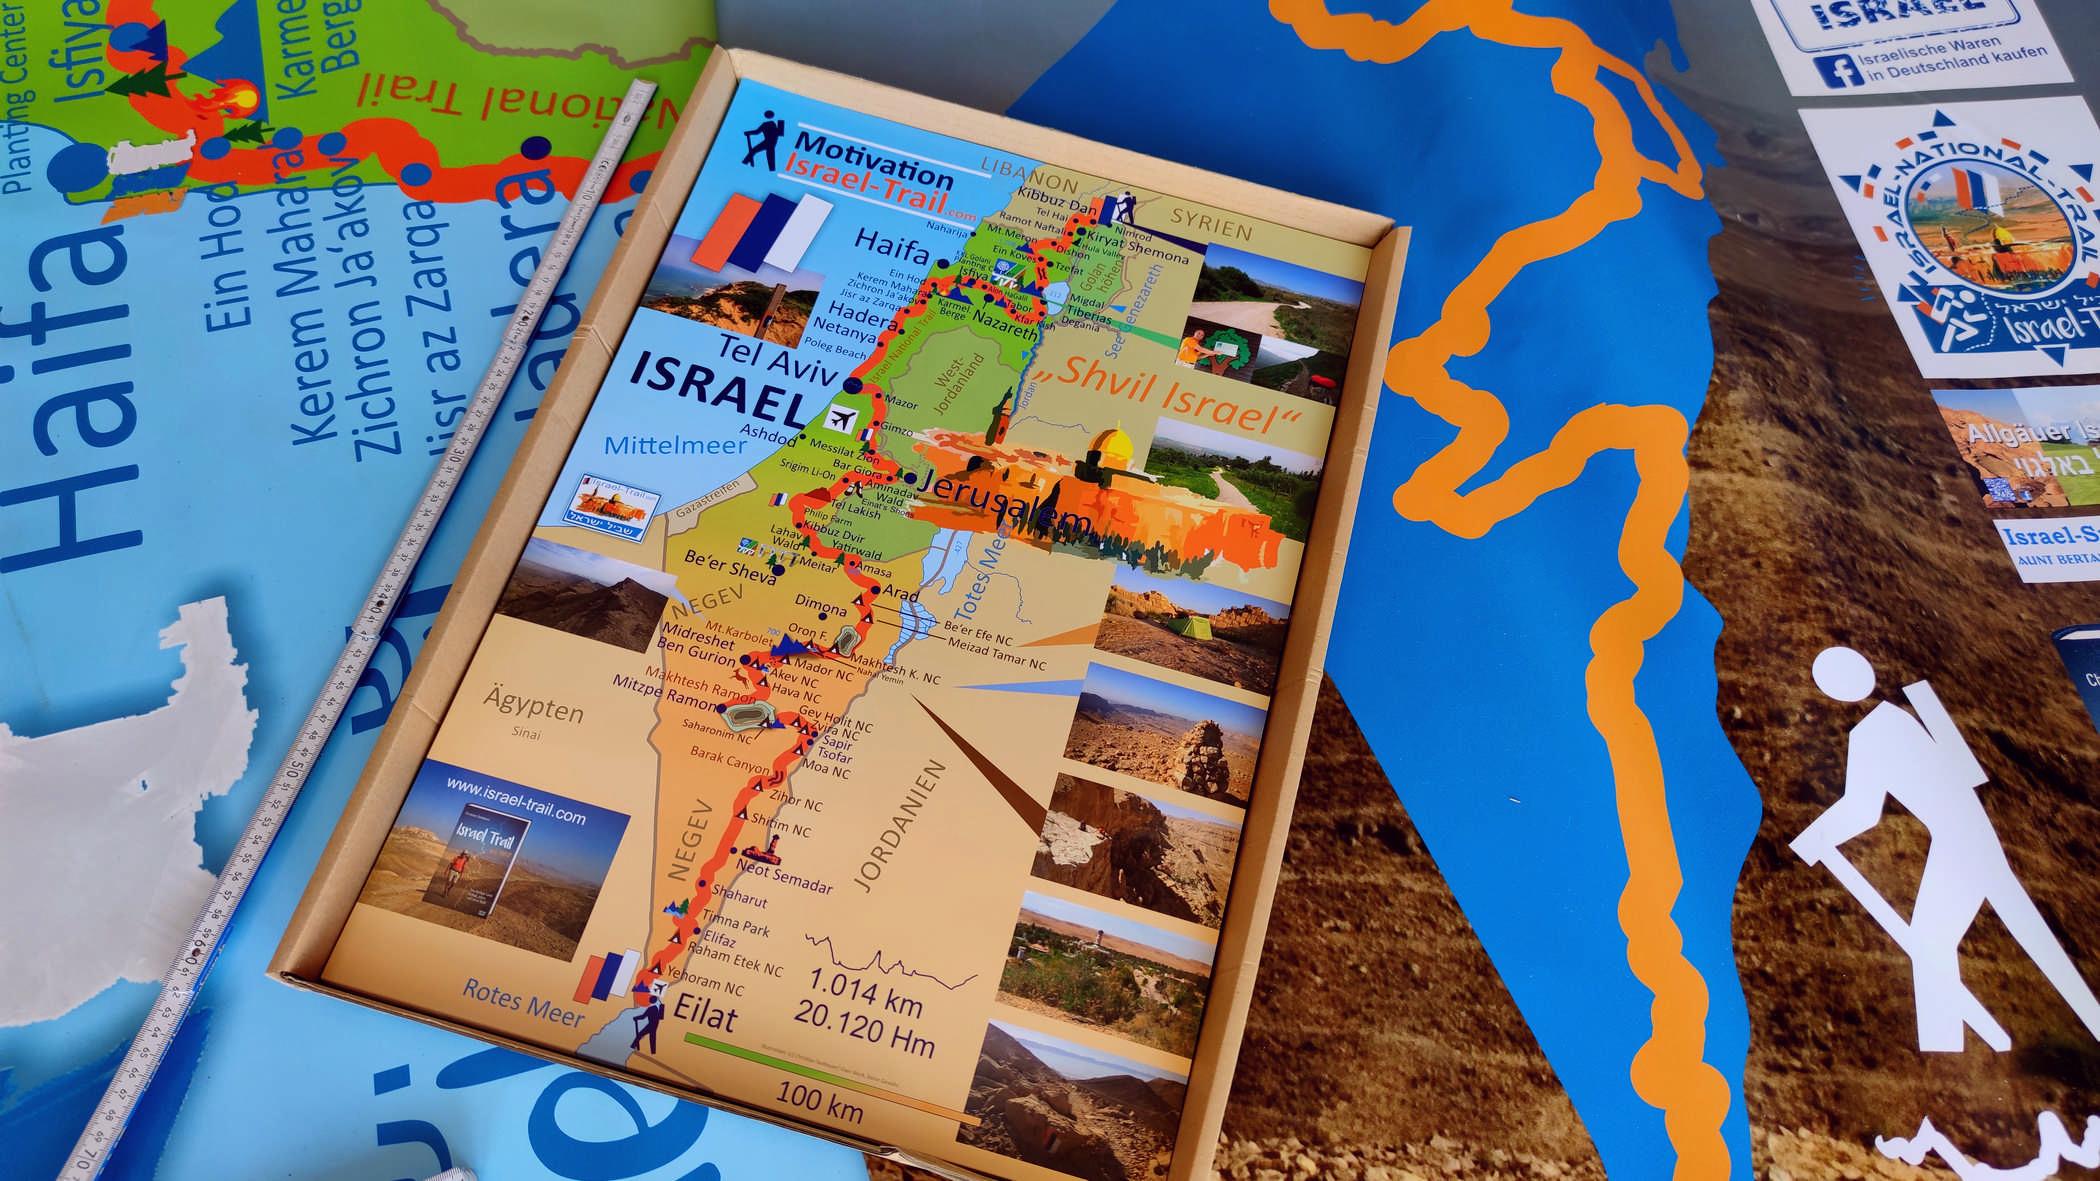 Israel-Landkarte Poster, Motivationsposter zum Wandern, Israel-Trail